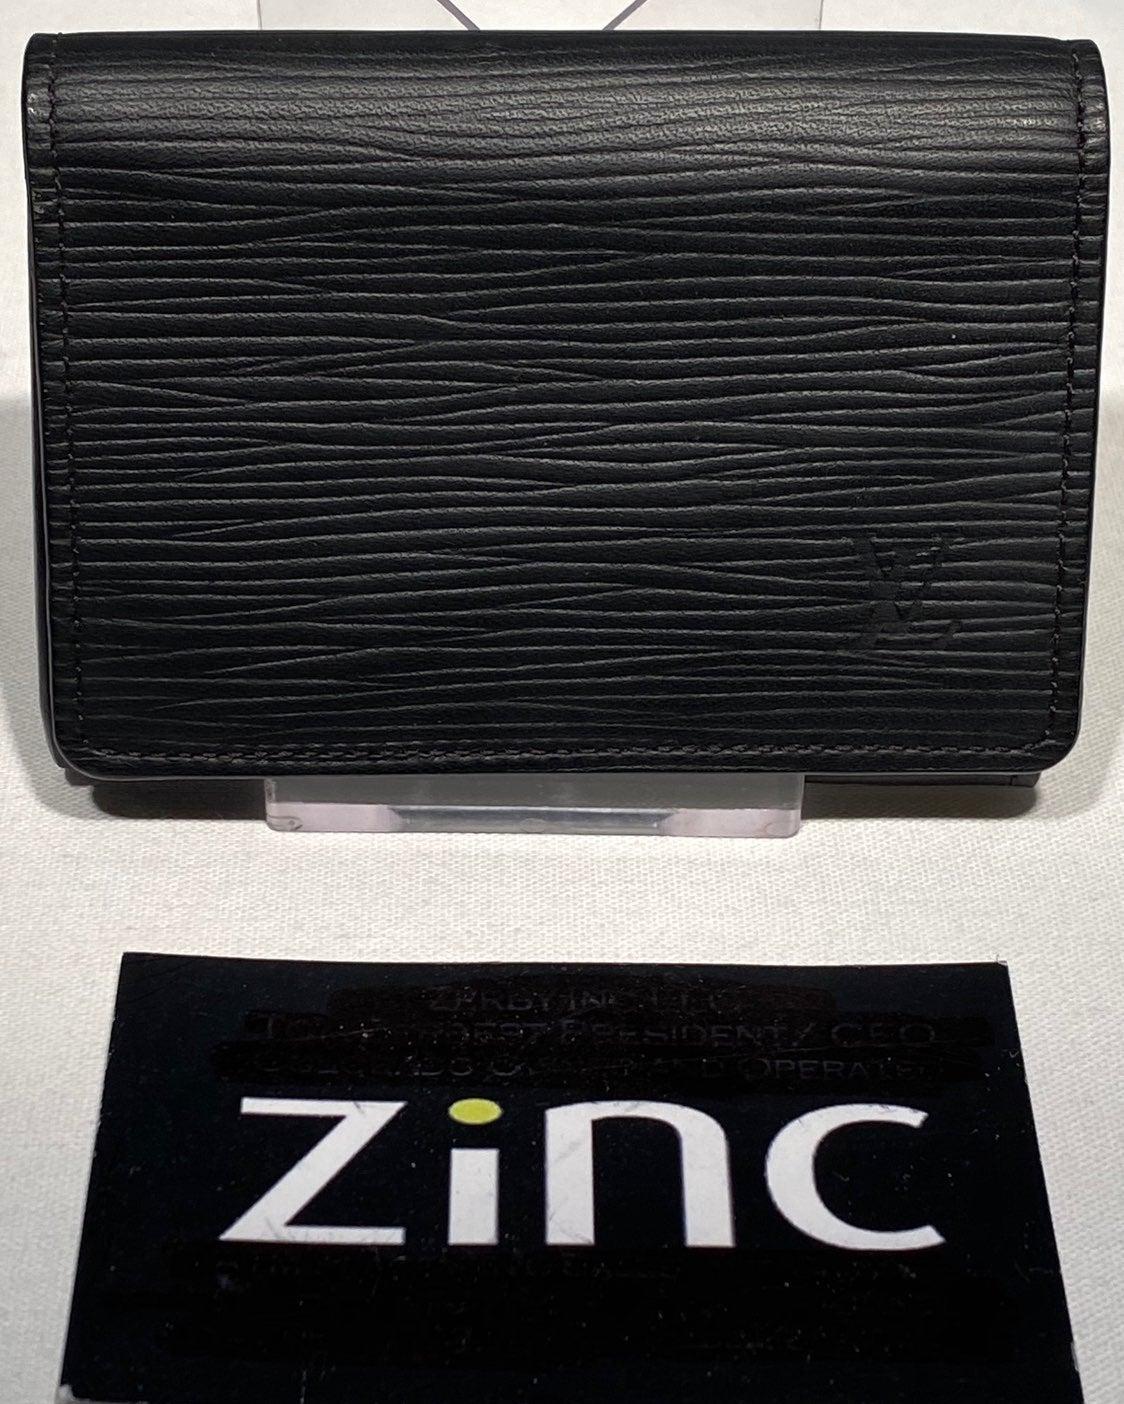 Louis Vuitton Black Epi Card Holder